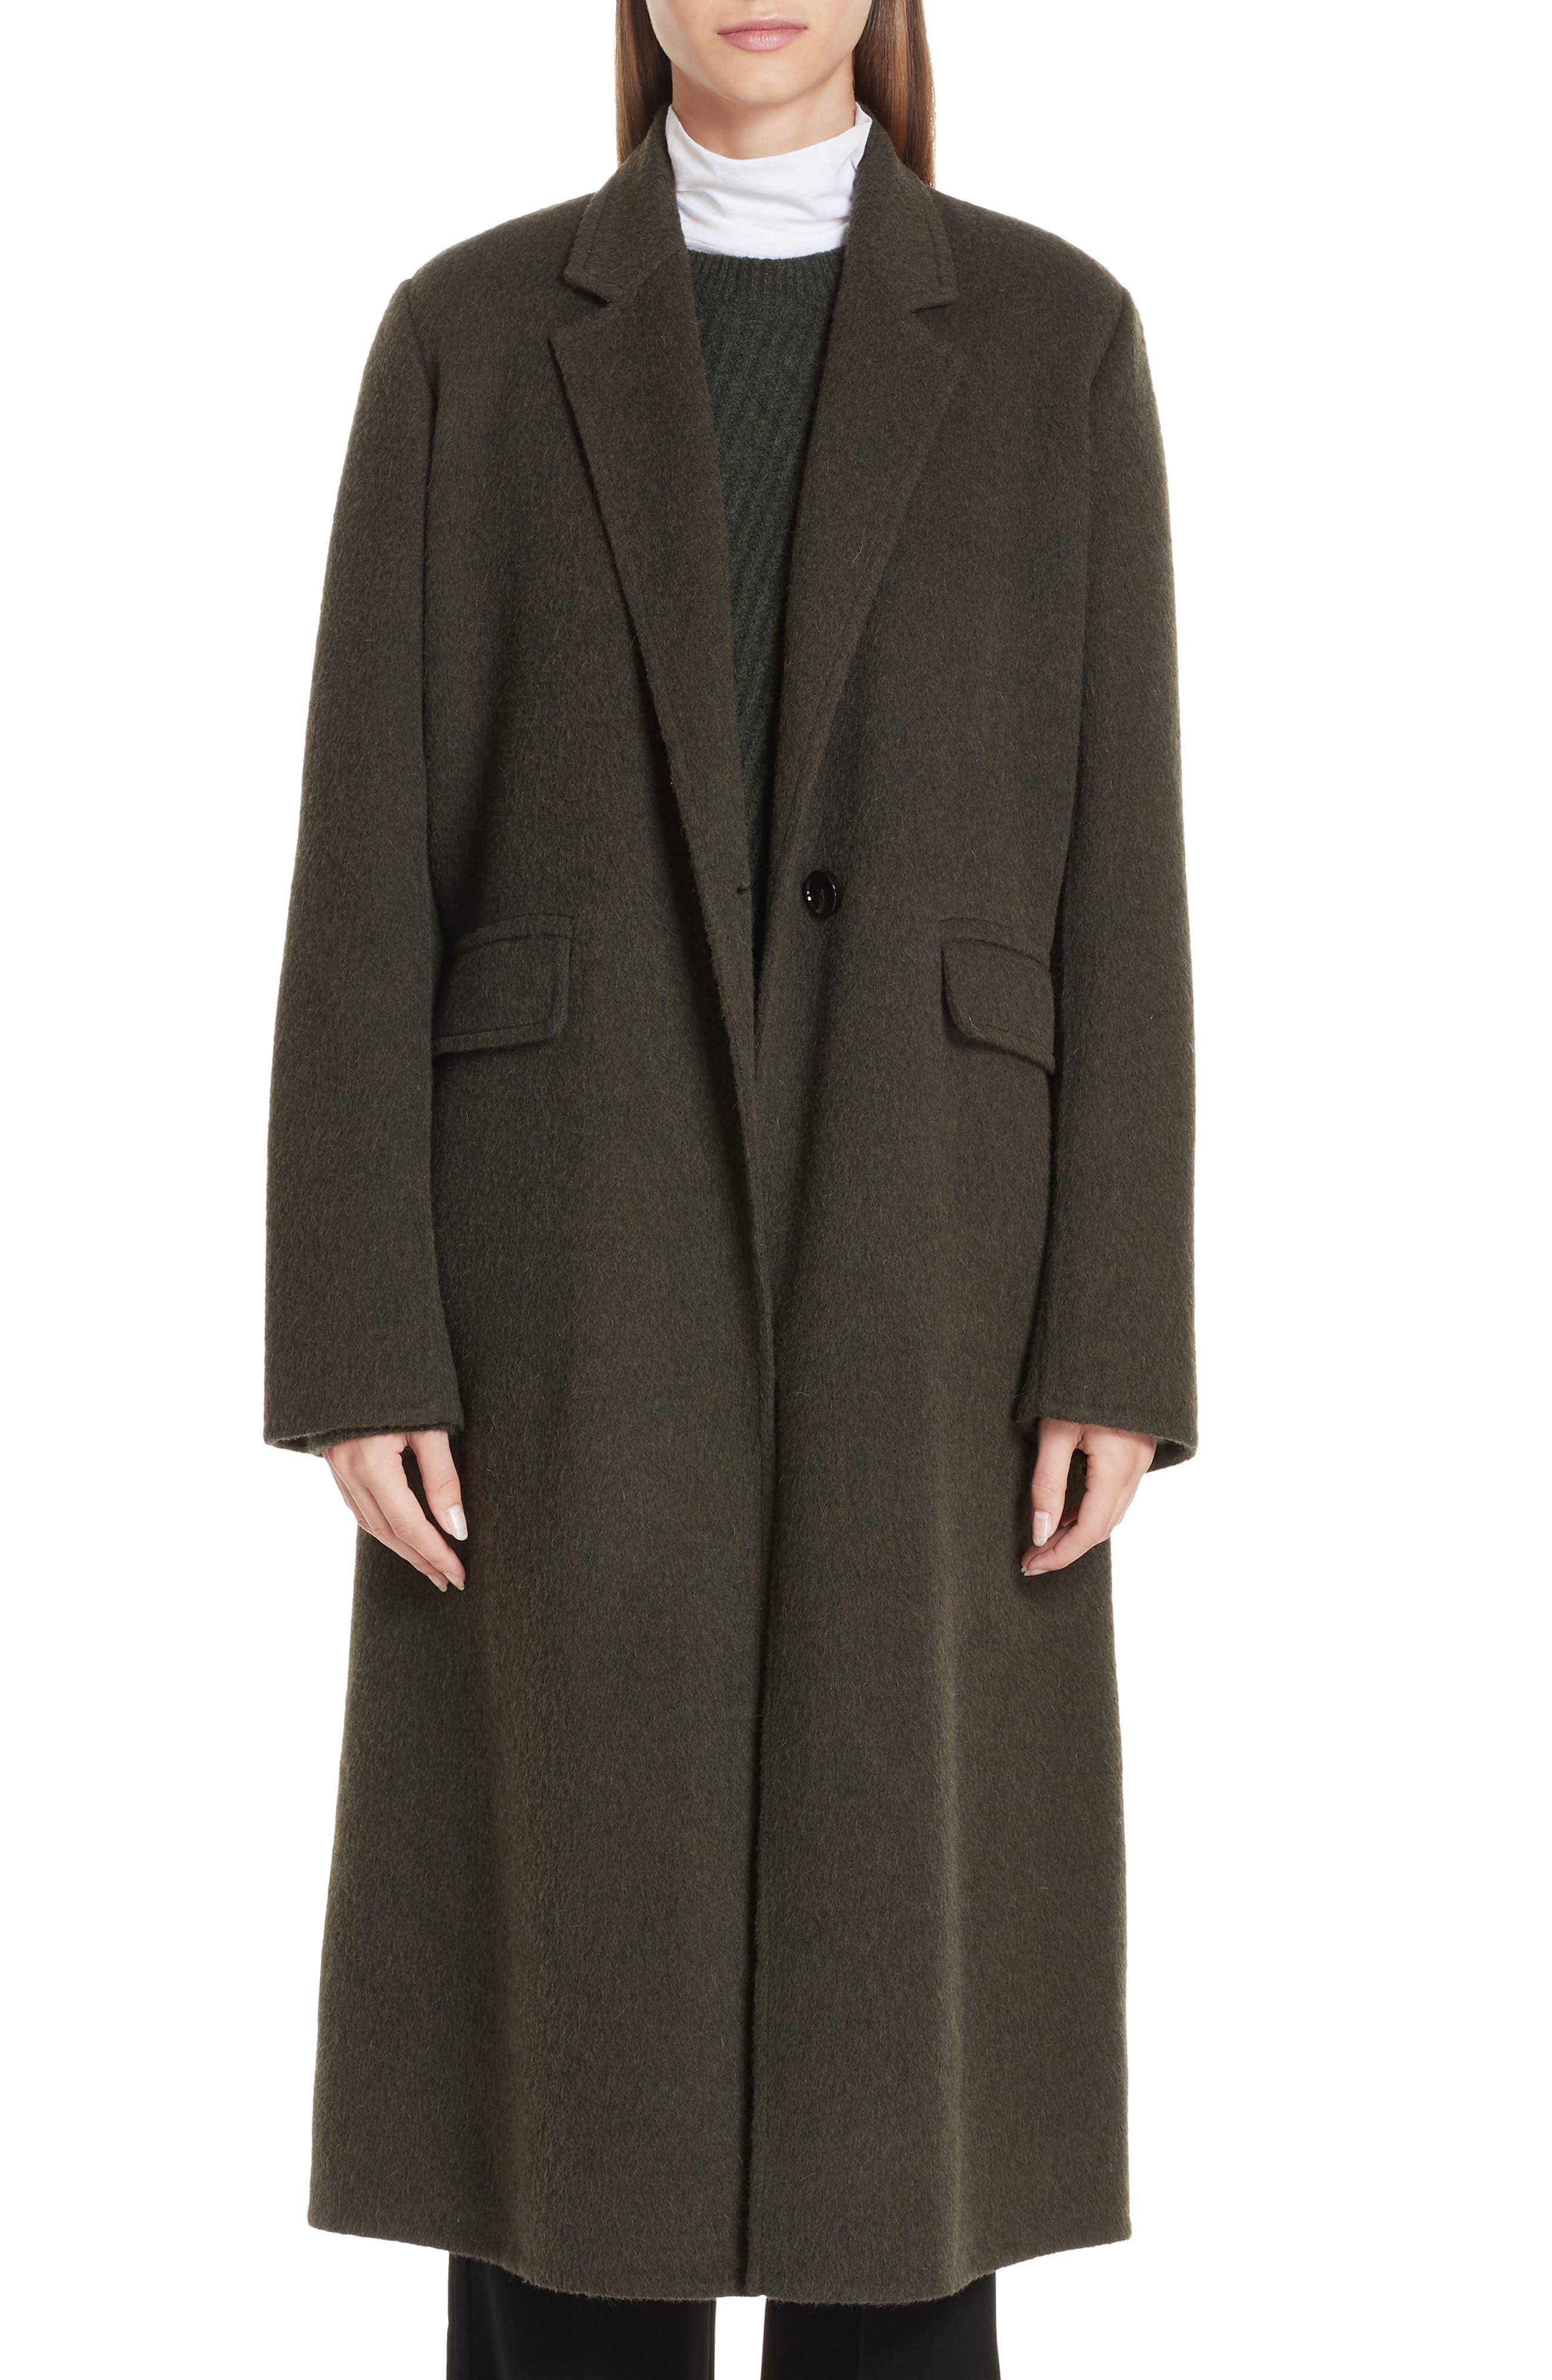 VINCE,                             Long Wool Alpaca Blend Coat,                             Main thumbnail 1, color,                             341